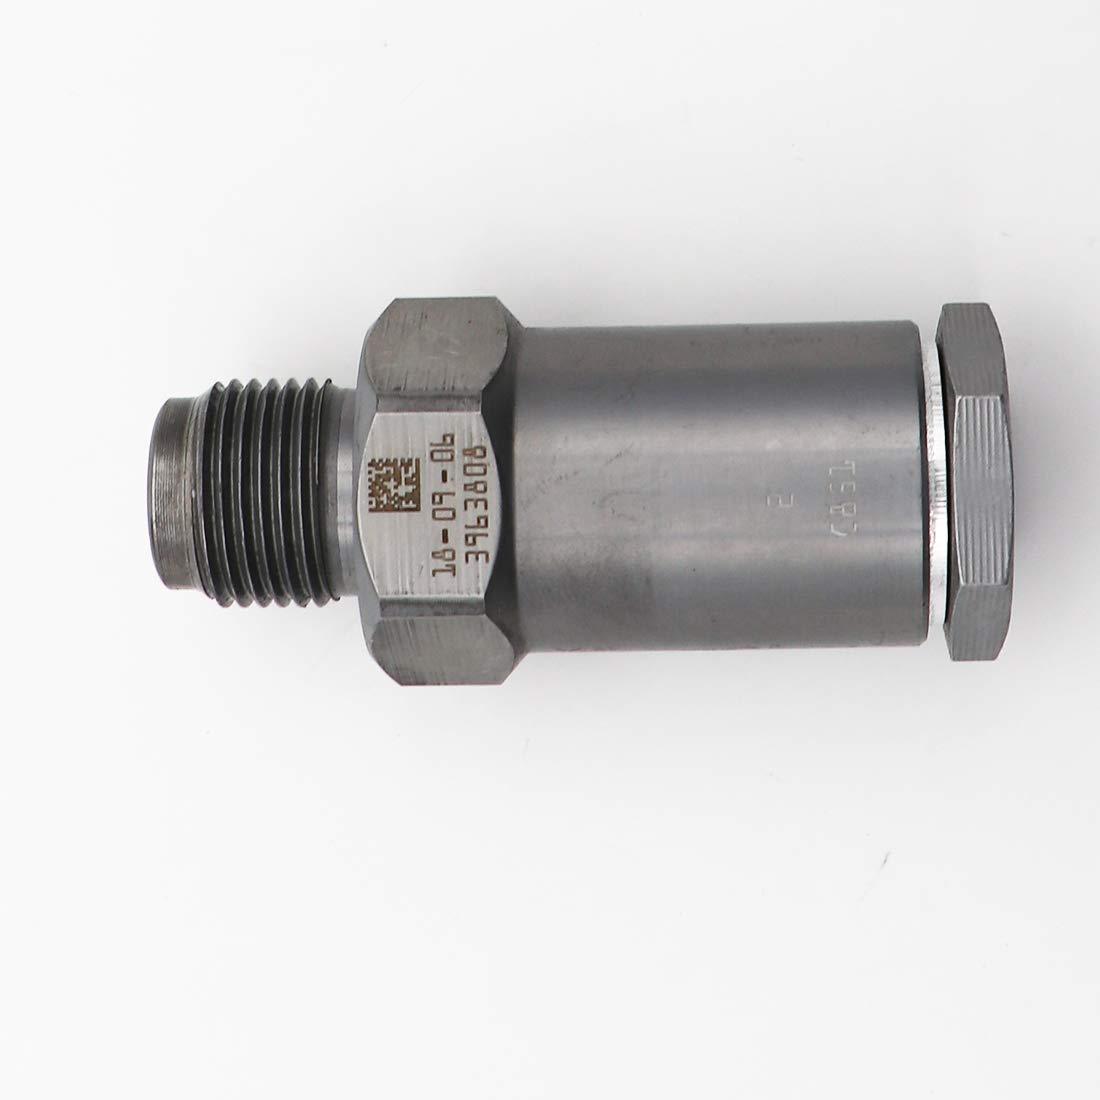 KIPA Fuel Pressure Relief Limiter Valve For 2003-2007 Dodge CUMMINS 5.9 DIESE Engines Ram 2500 3500 OEM Part Number 3963808 3947799